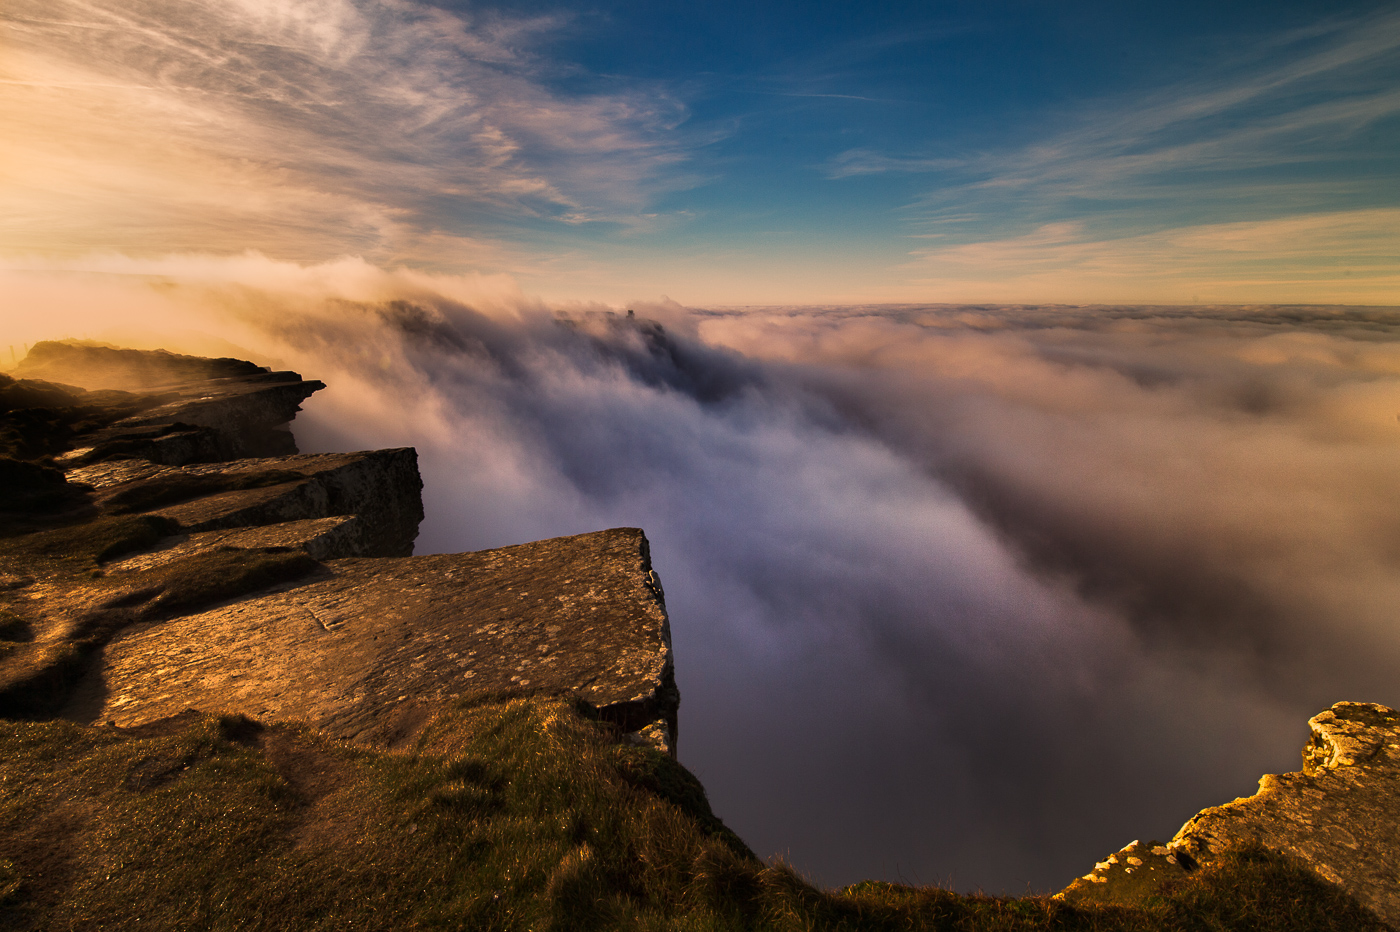 cliffs_of_moher_in_mist_fog